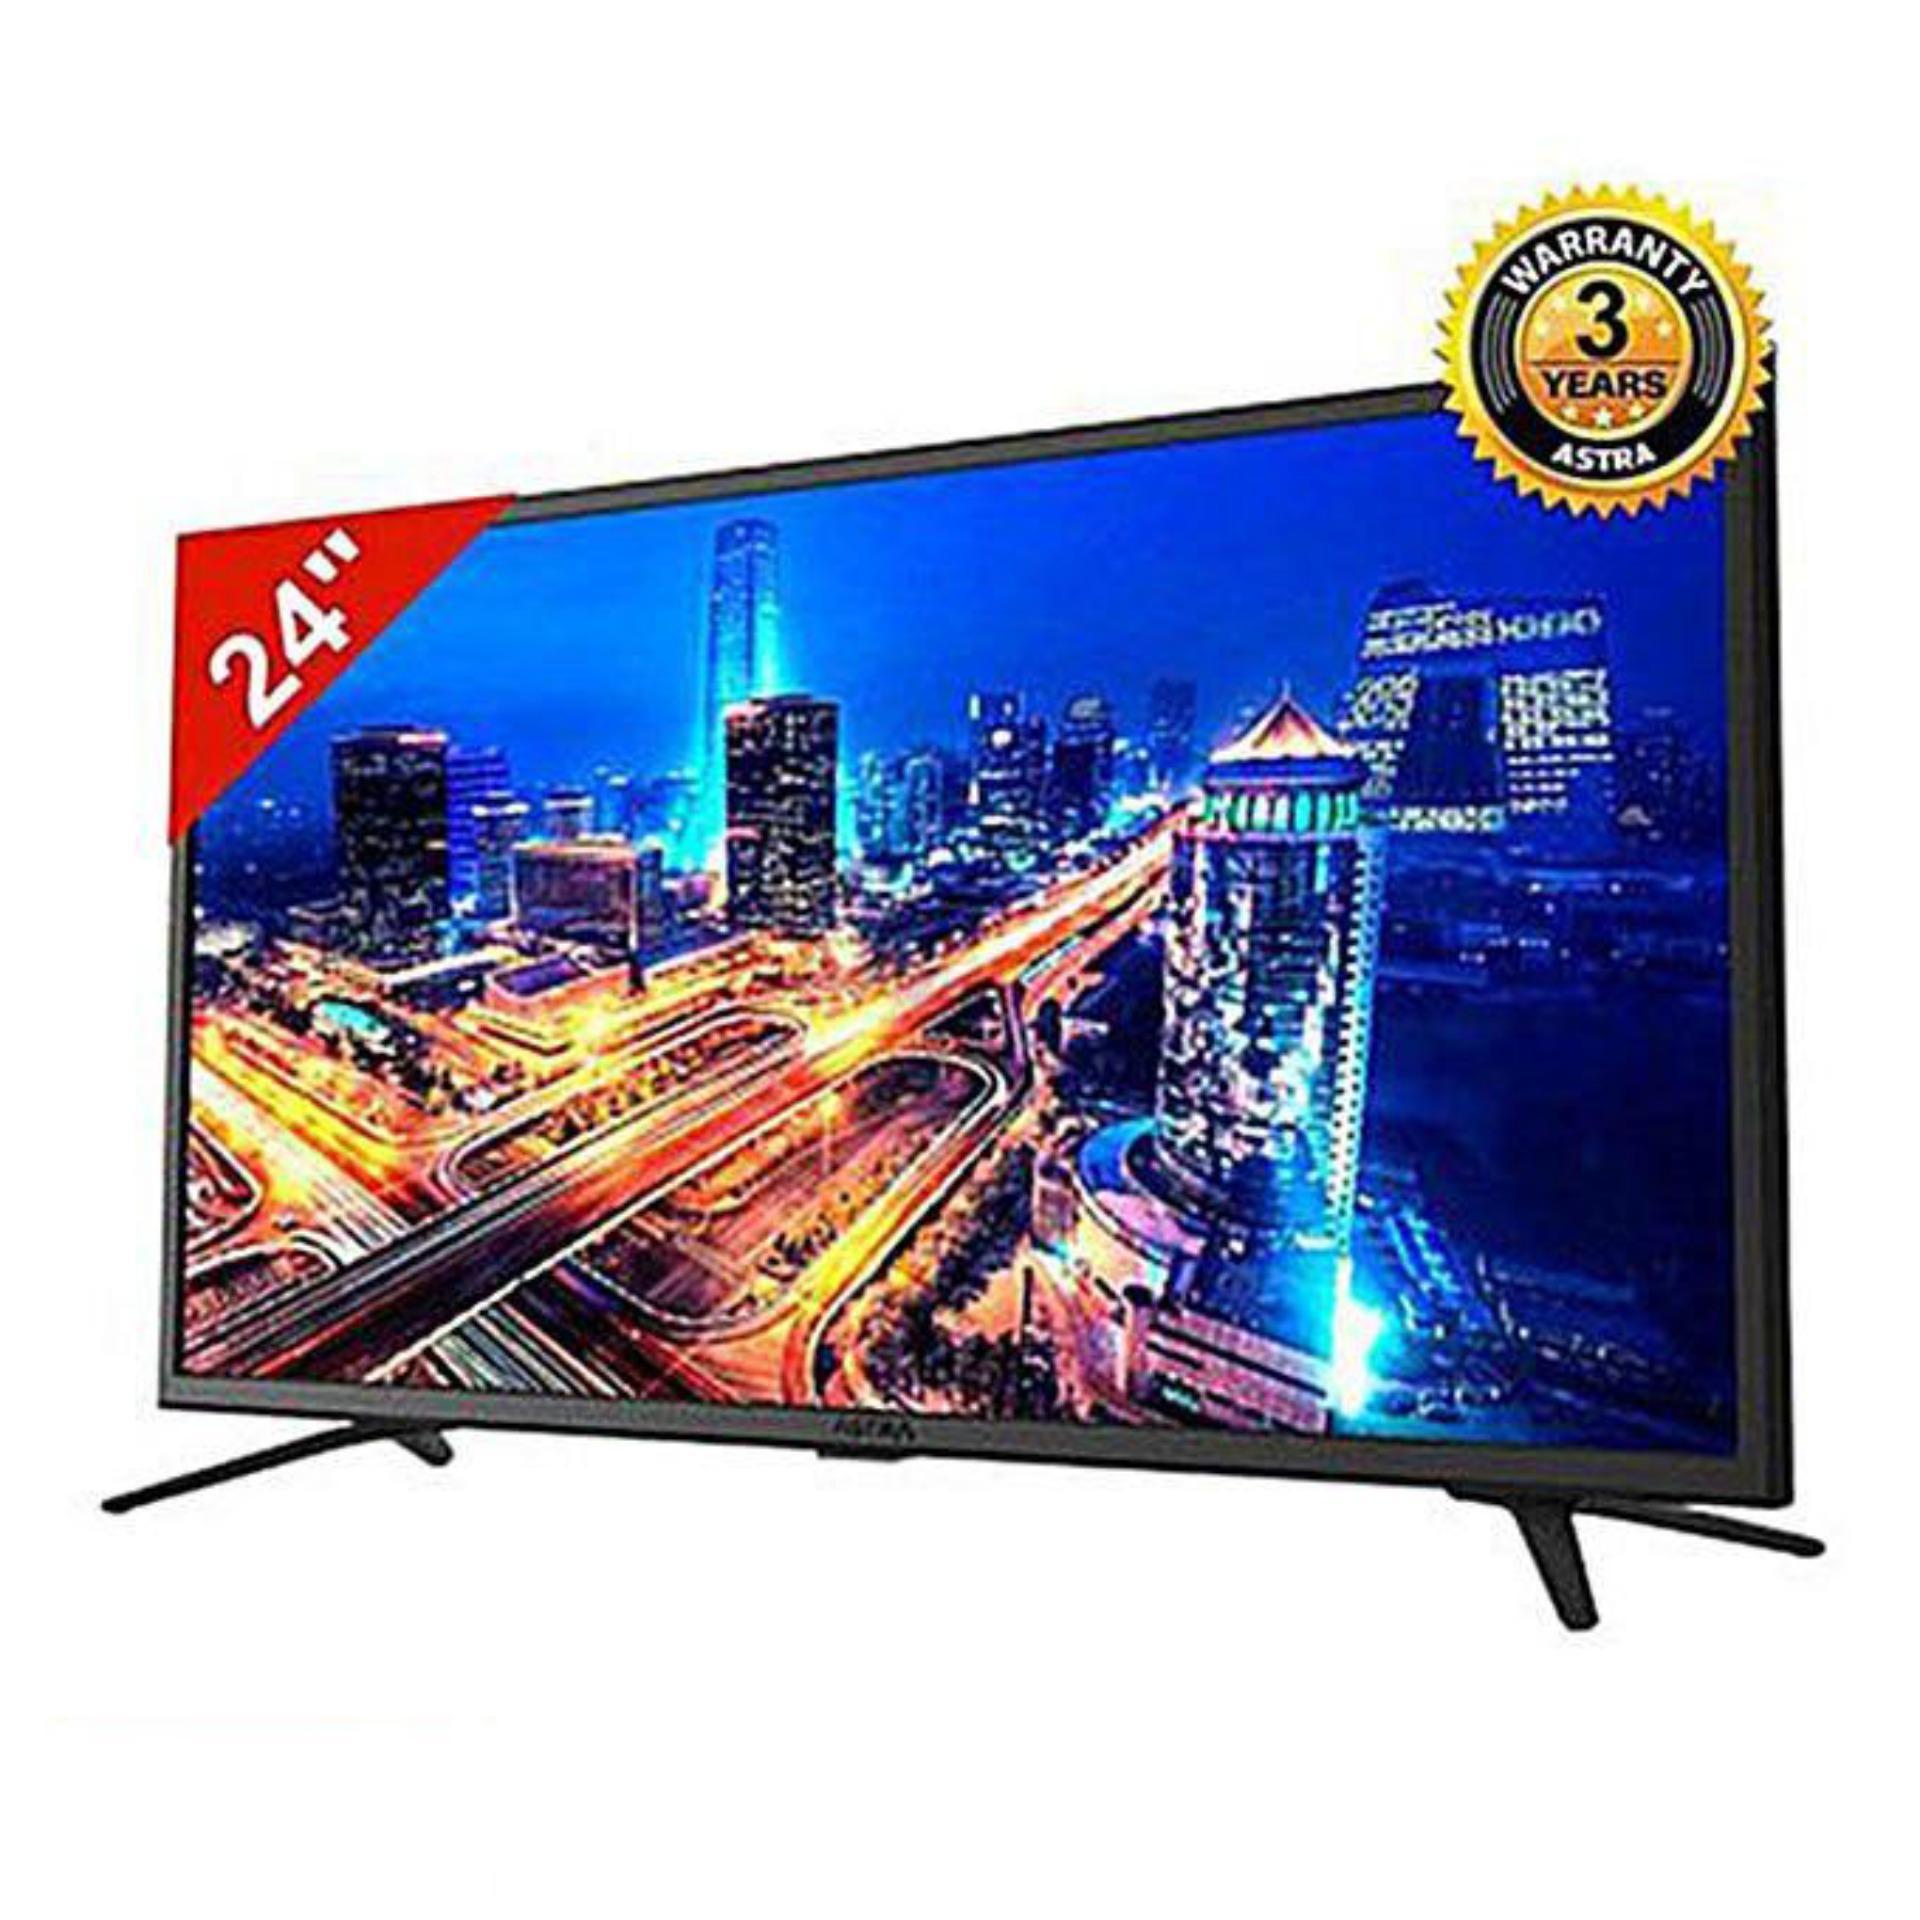 Acerastra Buy At Best Price In Bangladesh Daraz Keyboard Laptop Acer 4736 4738 4740 Astra 24a4000 Led Slim Tv 24 Black